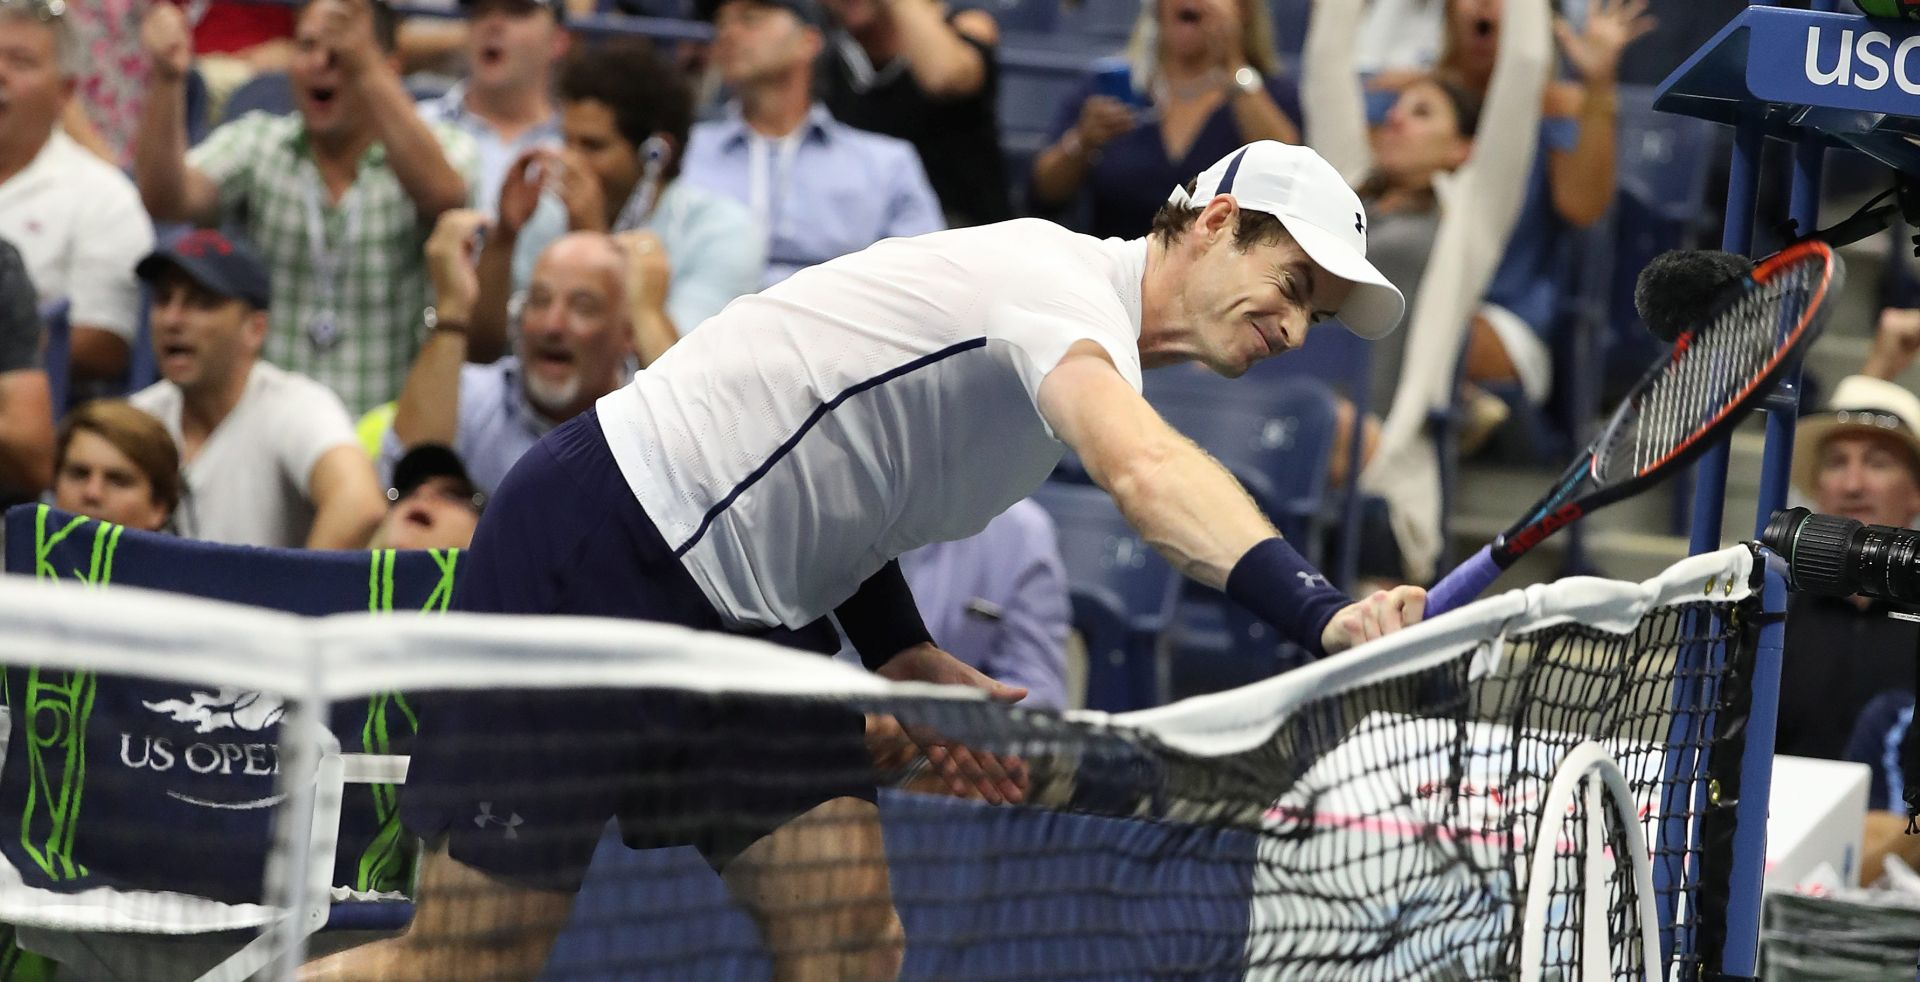 US OPEN Nishikori izbacio Murrayja, u polufinalu na Wawrinku